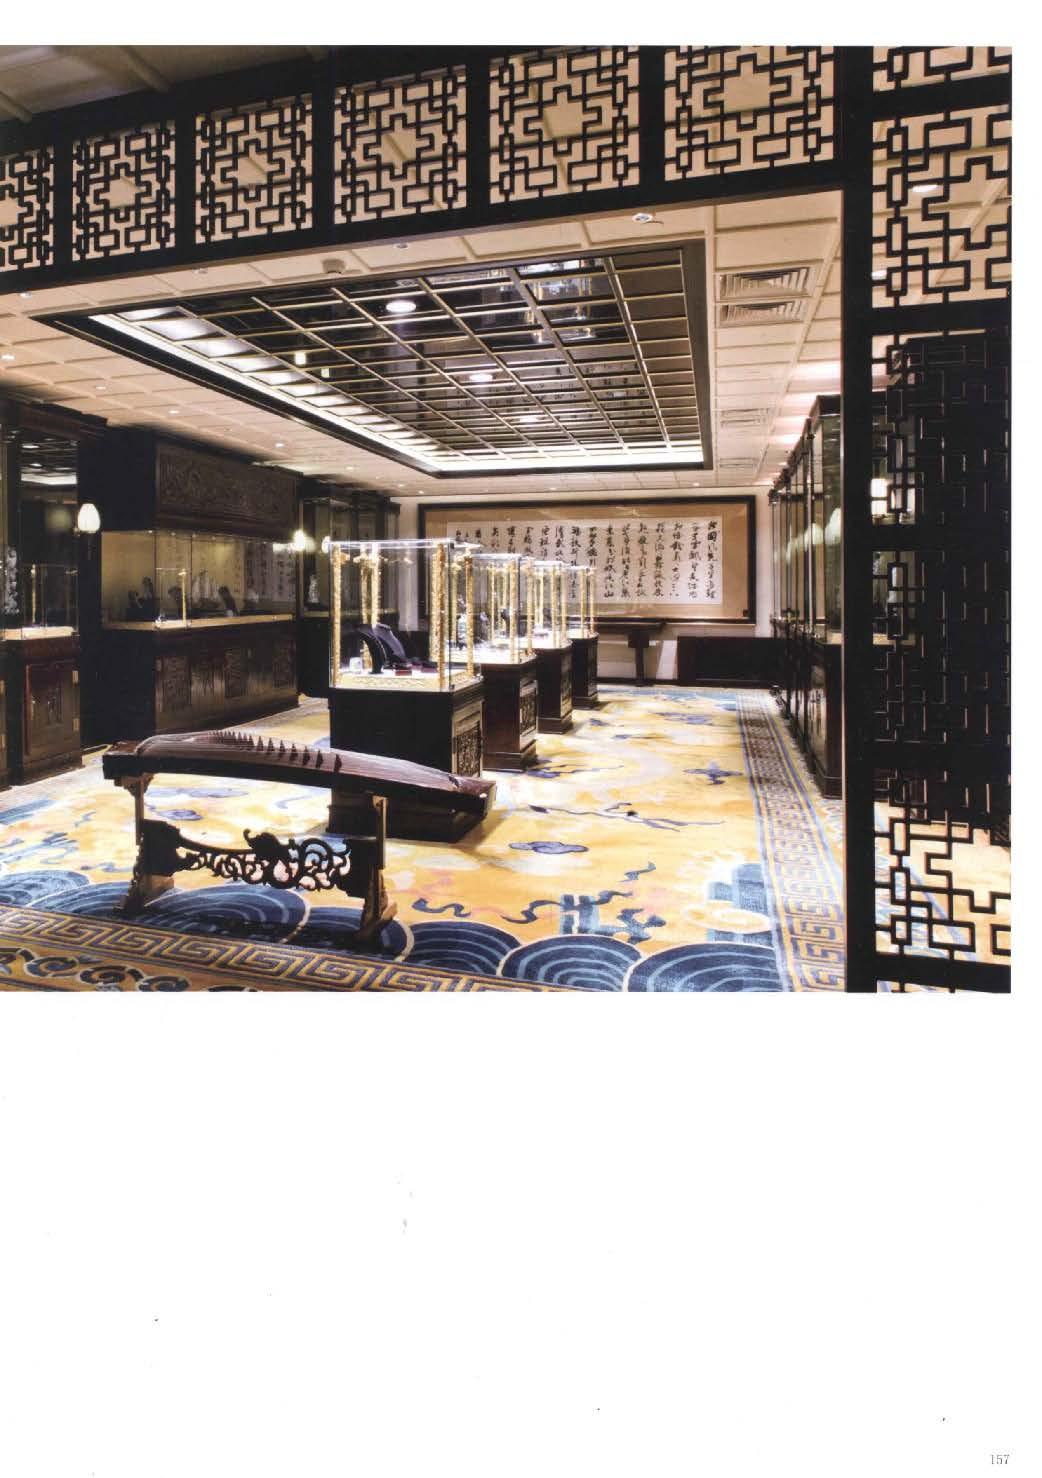 H073 东方风情 会所、餐饮细部解析_Page_155.jpg